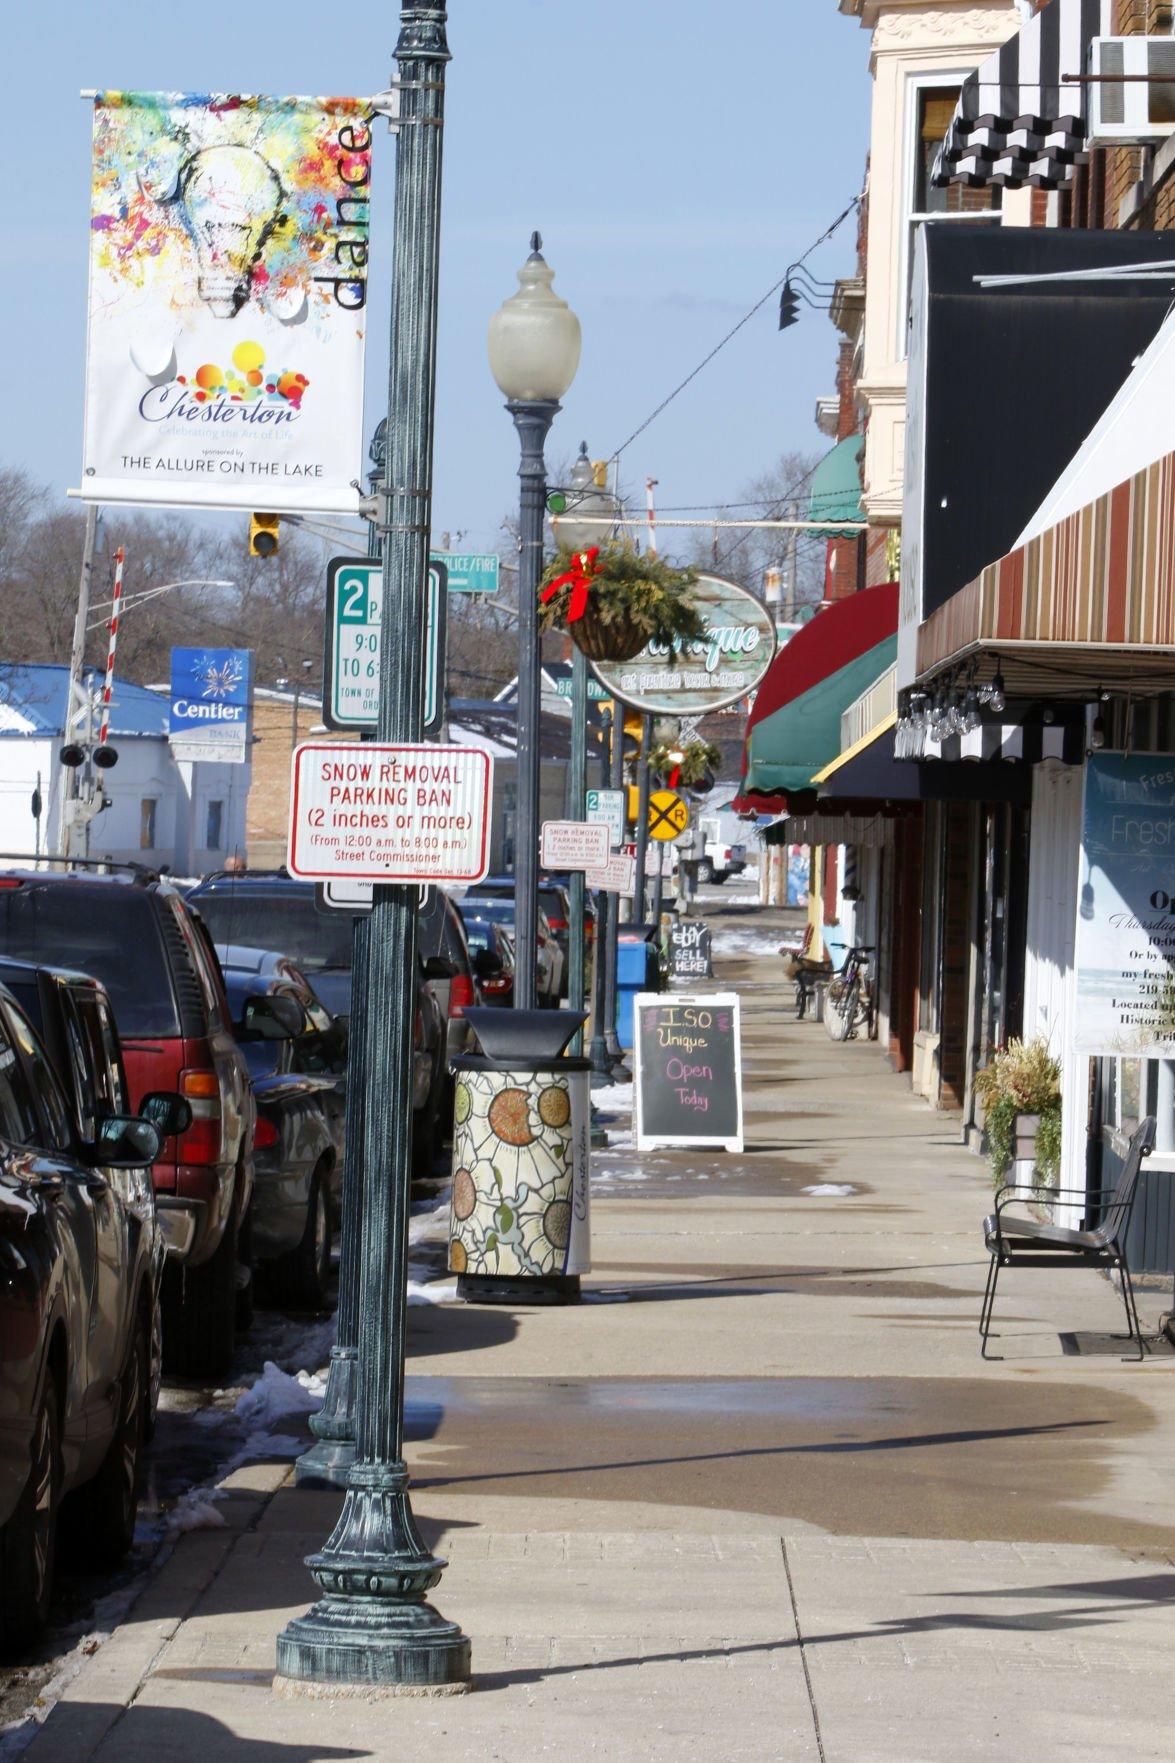 Downtown Chesterton